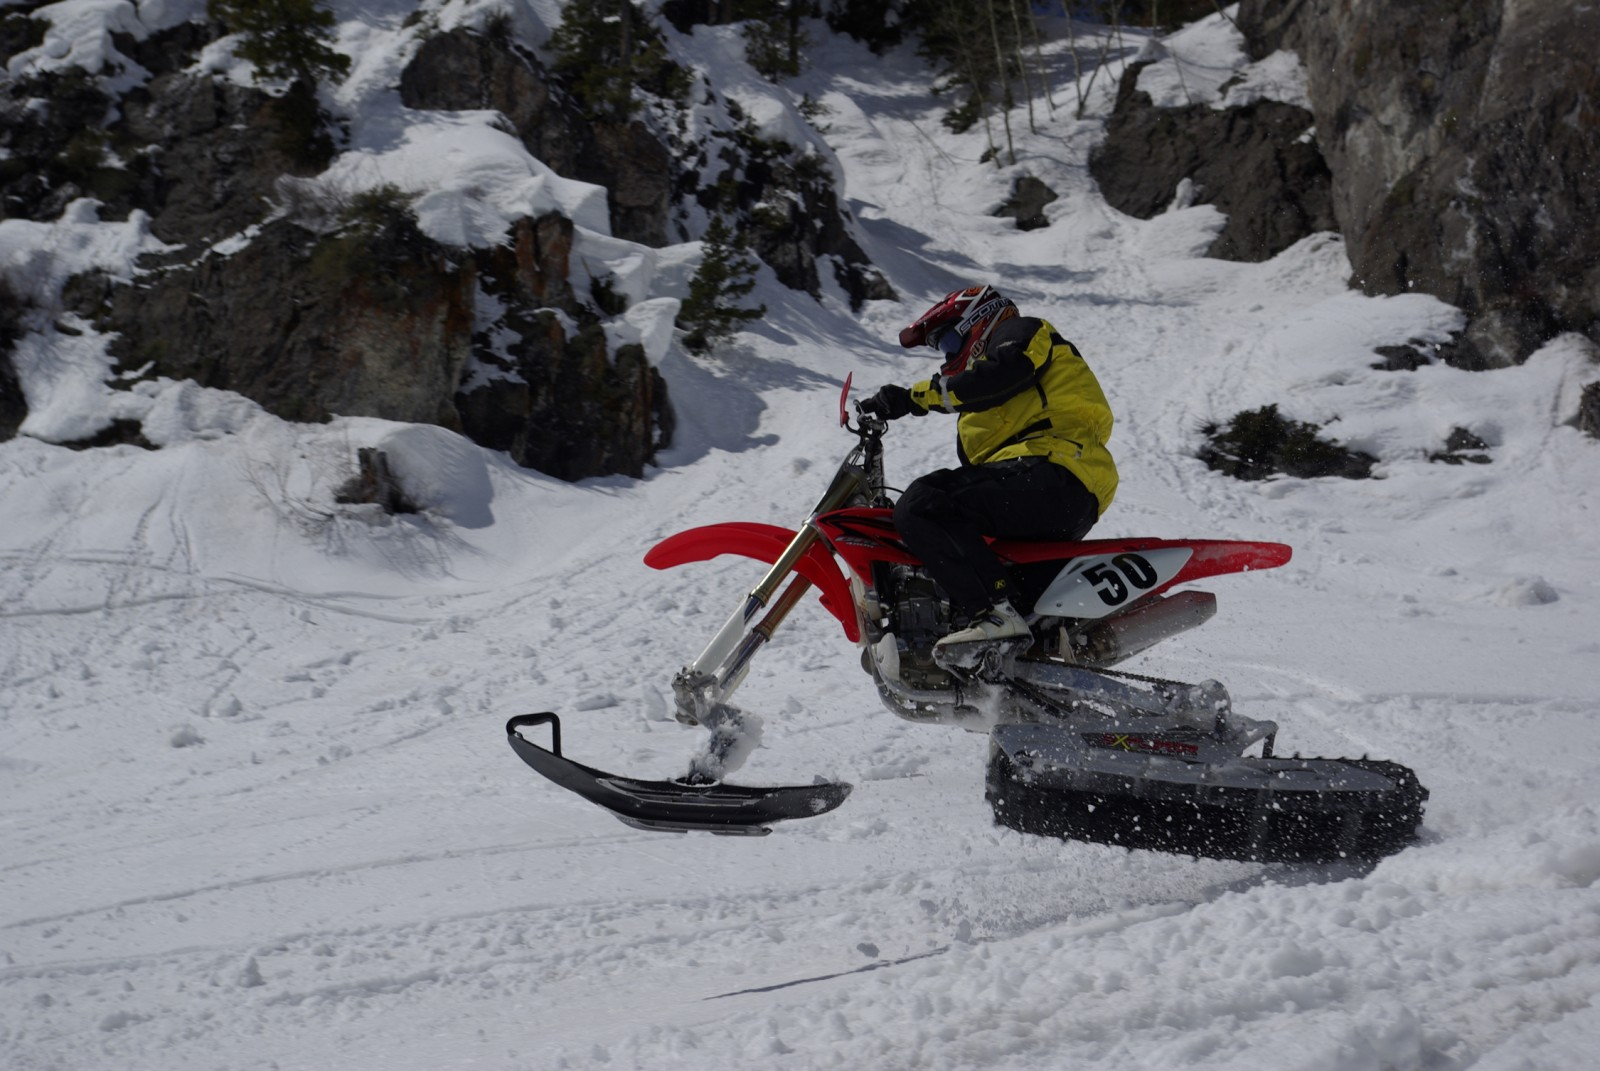 Explorer-snowbike-track-system-for-dirt-bike-supermoto-enduro-mx-AD-Boivin-79-1600x1071